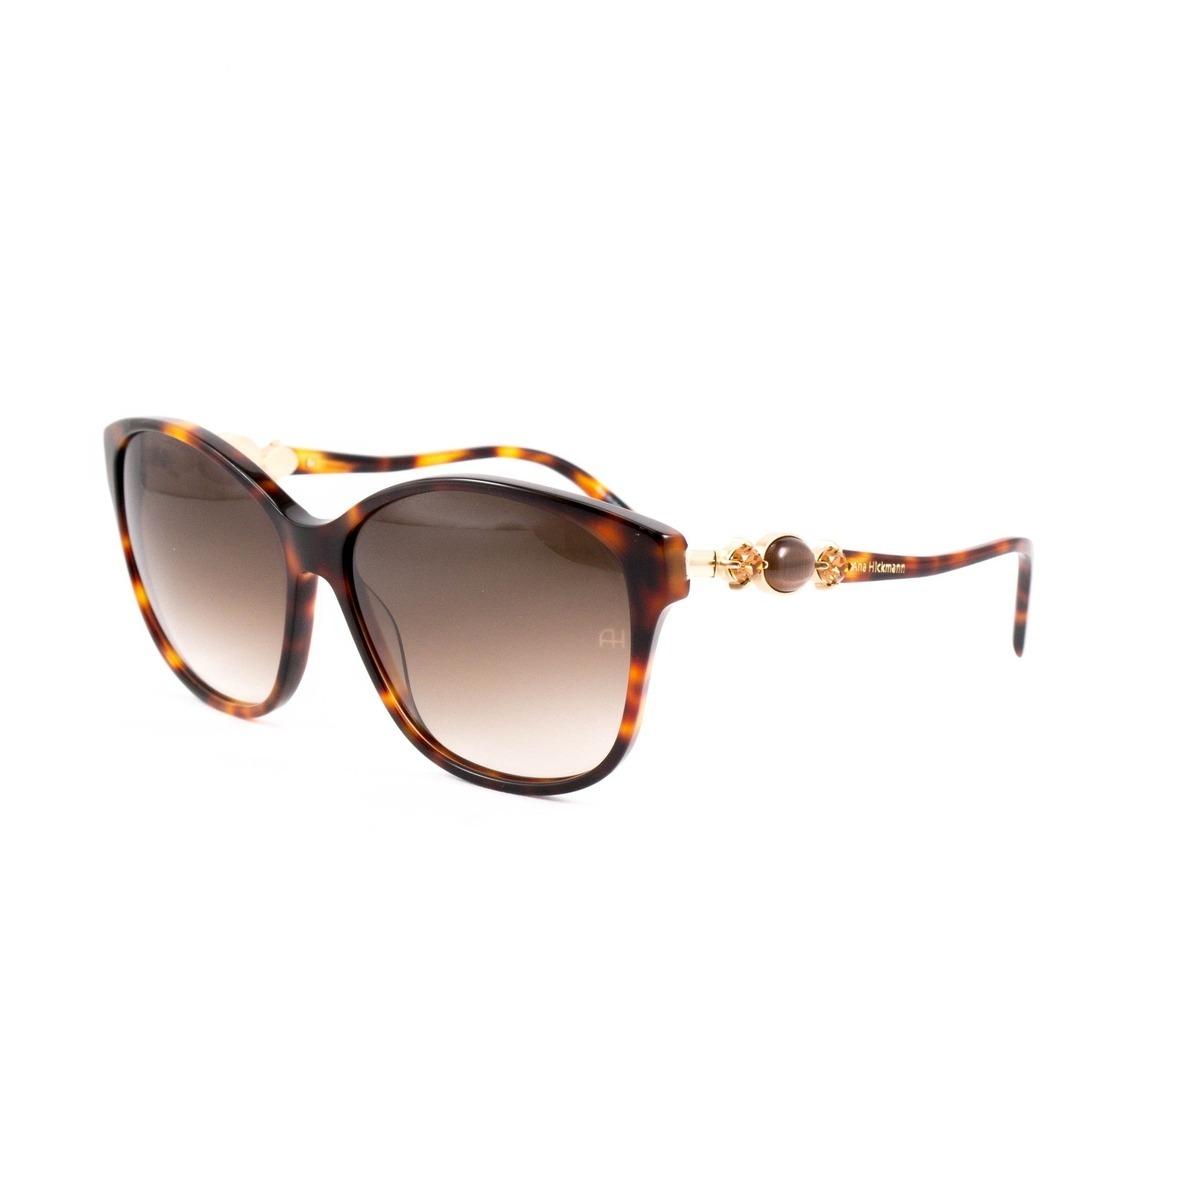 f6144c620c854 óculos de sol ana hickmann - ah9186 g21 - marrom. Carregando zoom.